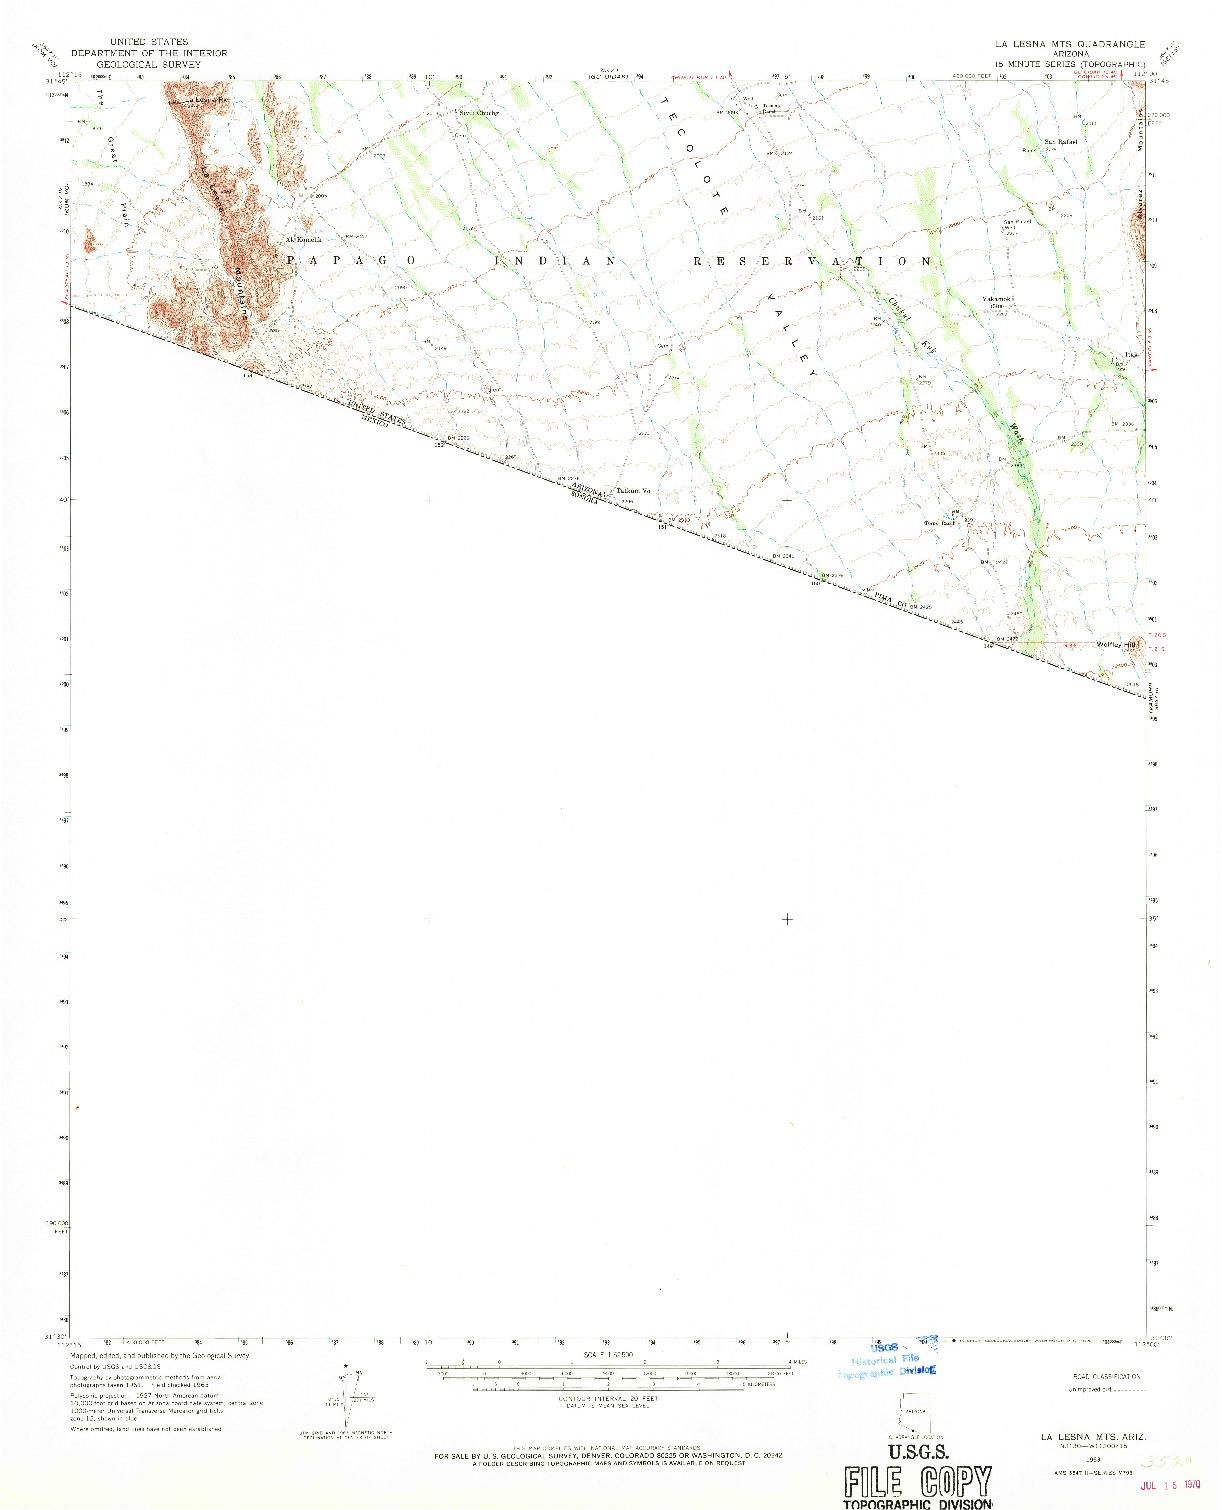 USGS 1:62500-SCALE QUADRANGLE FOR LA LESNA MTS., AZ 1963